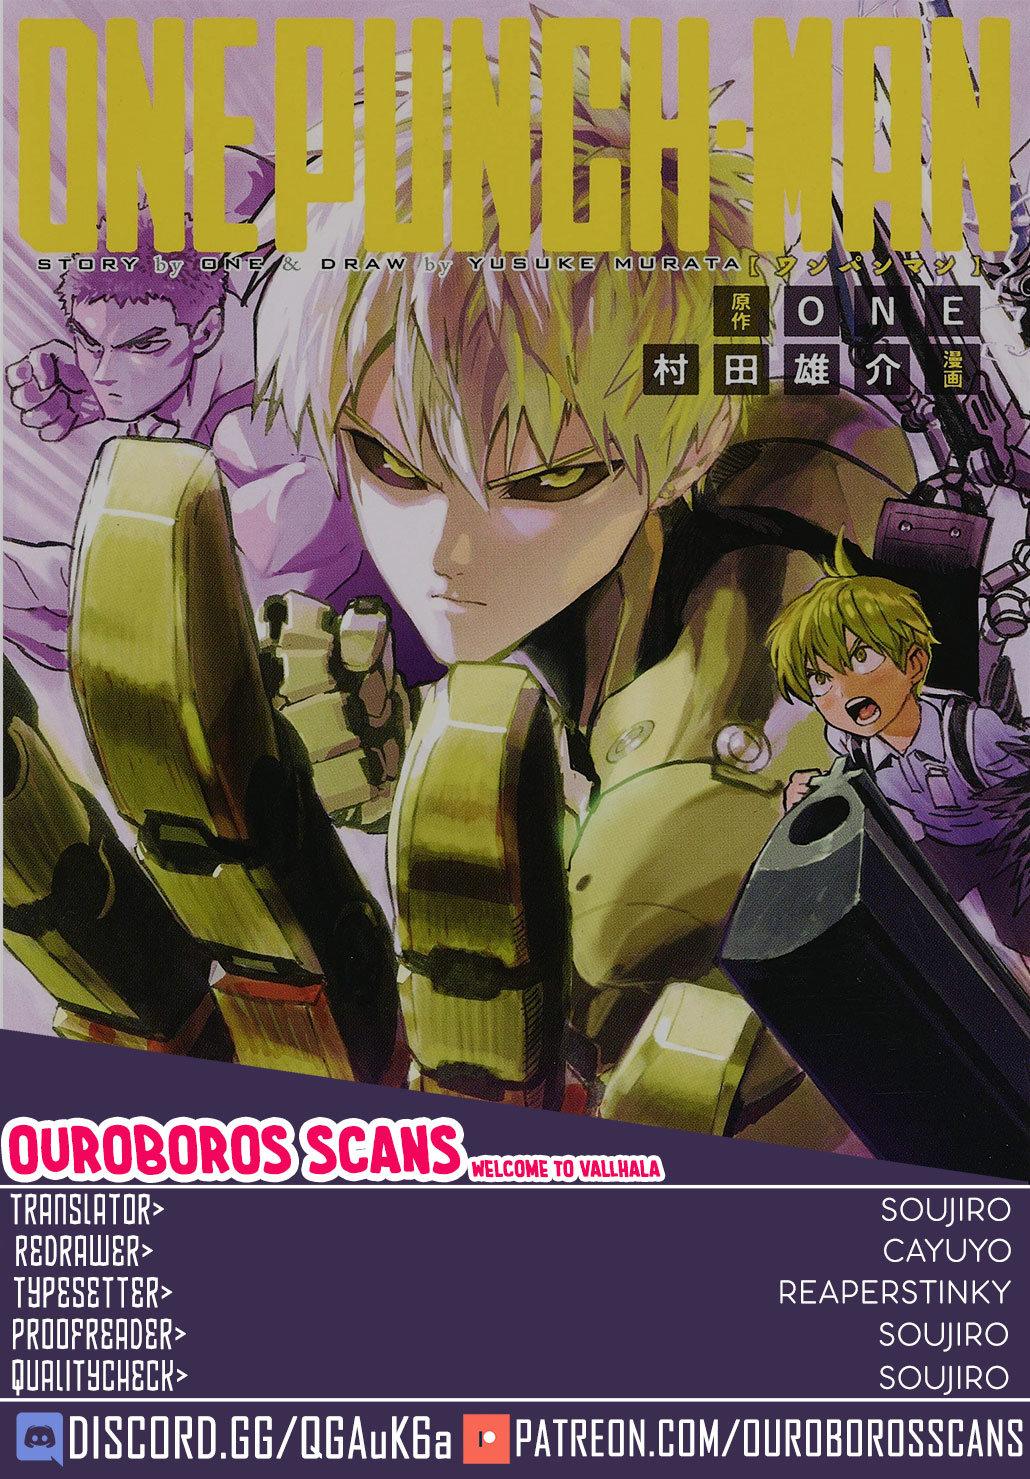 https://nine.mangadogs.com/es_manga/pic8/21/14805/939348/f990518da54698e33be2ea01d6b75f59.jpg Page 1